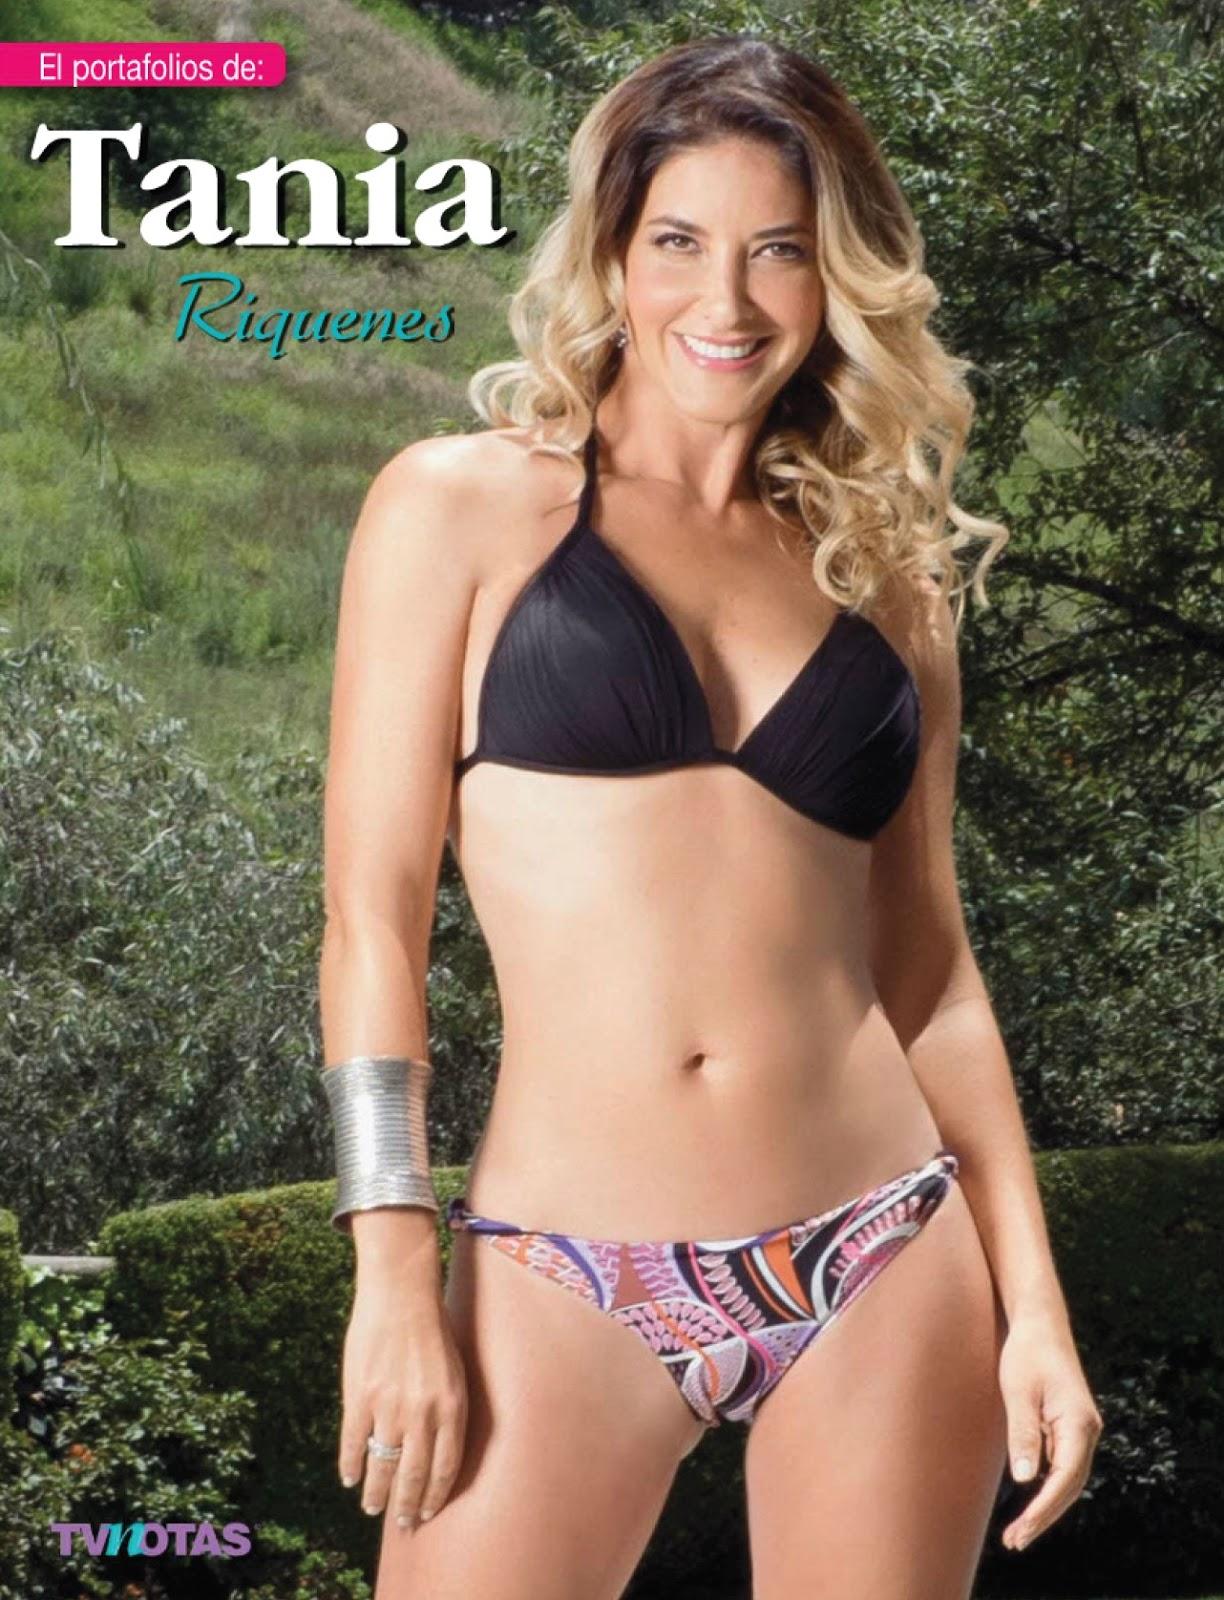 FOTOS: Tania Riquenes Bikini Tvnotas - Septiembre 2015